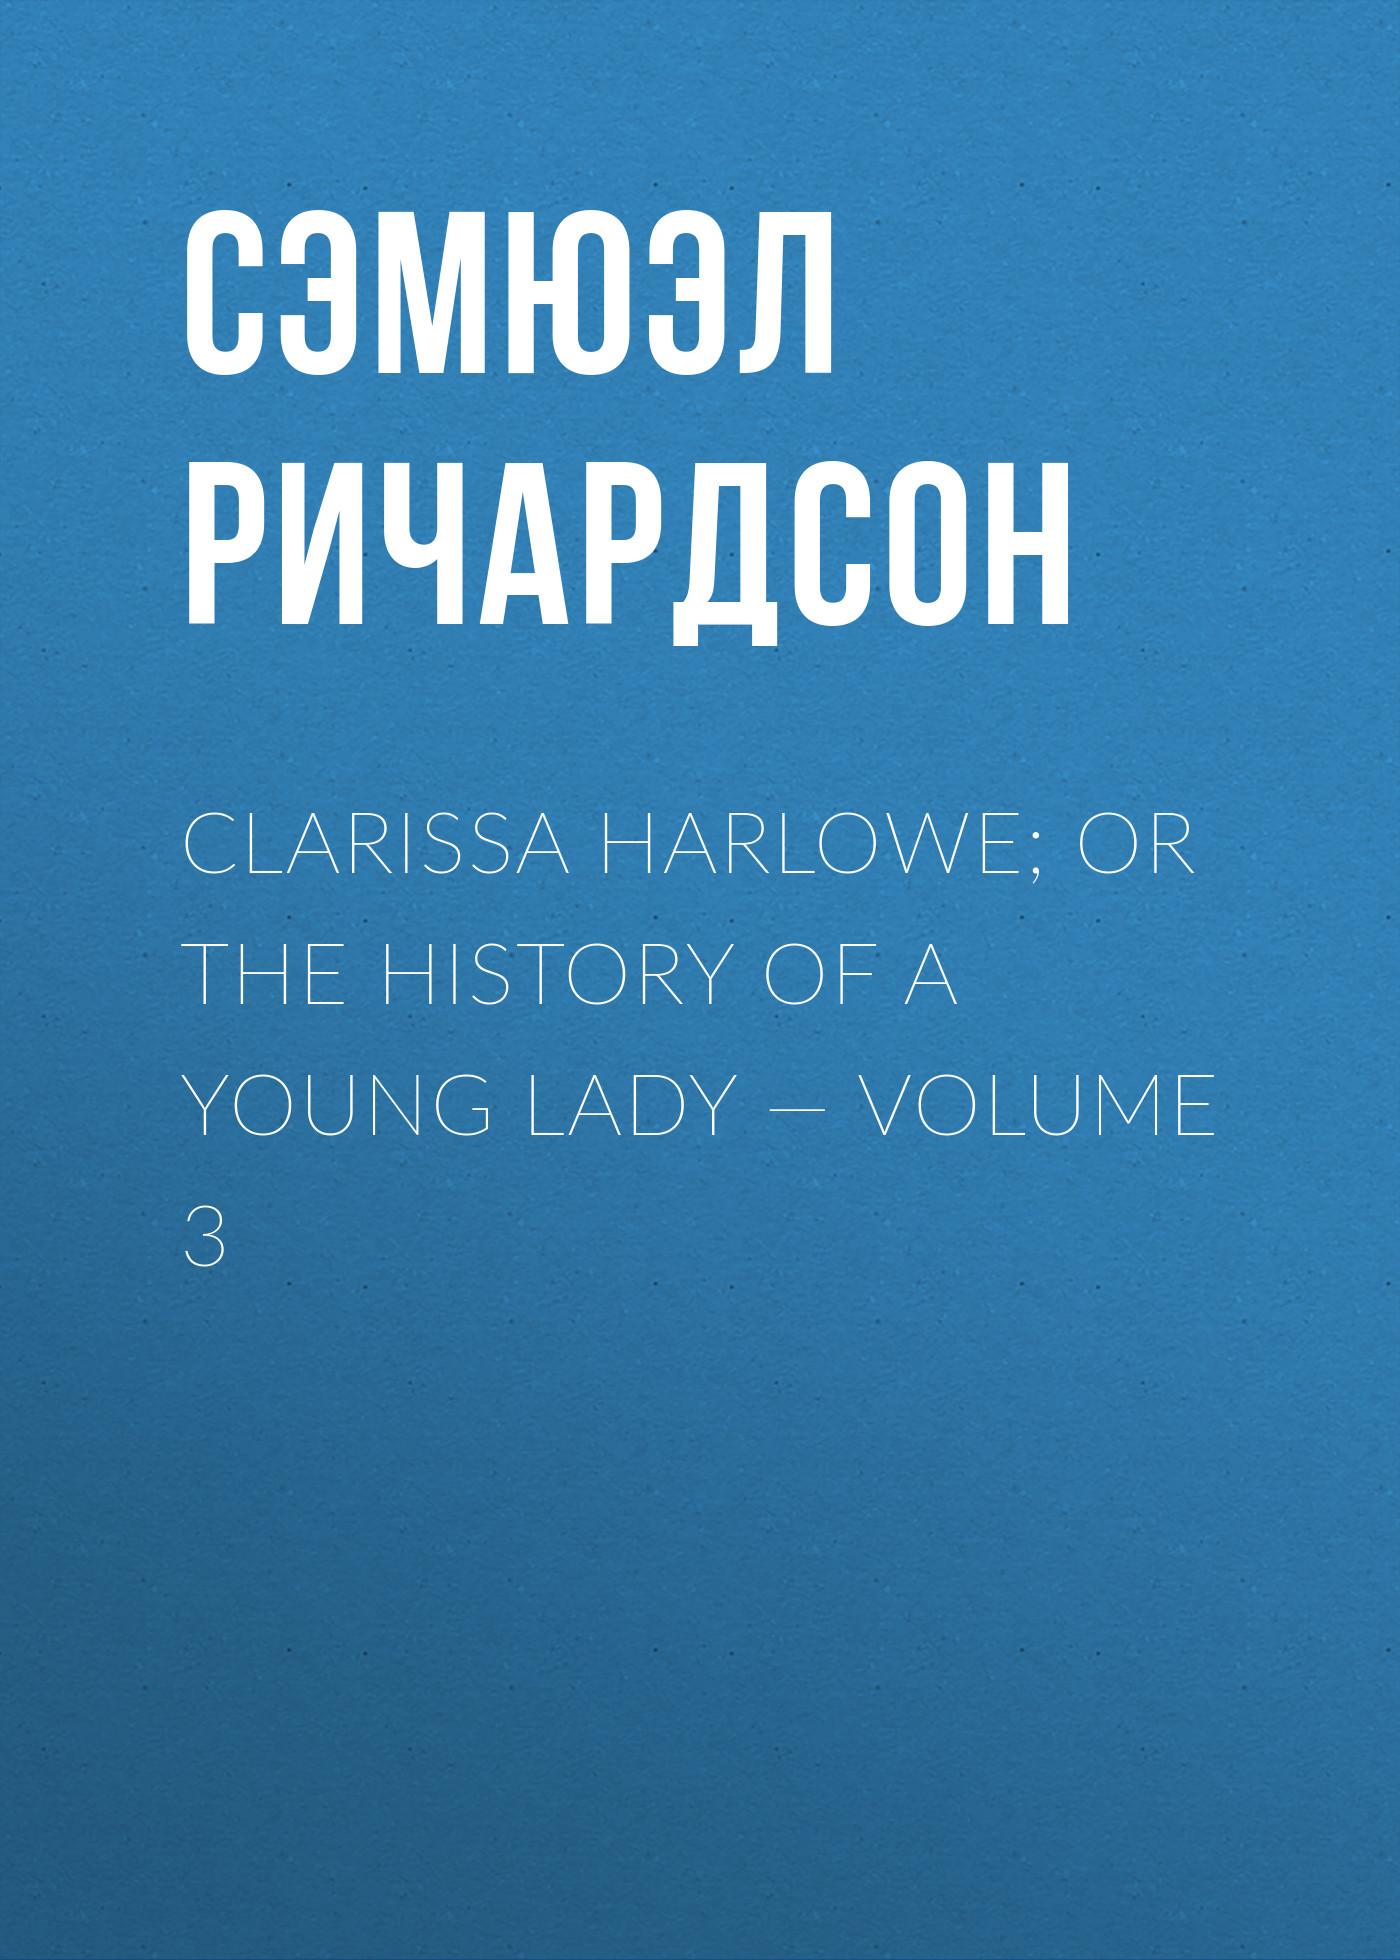 Сэмюэл Ричардсон Clarissa Harlowe; or the history of a young lady — Volume 3 сэмюэл ричардсон clarissa harlowe or the history of a young lady volume 2